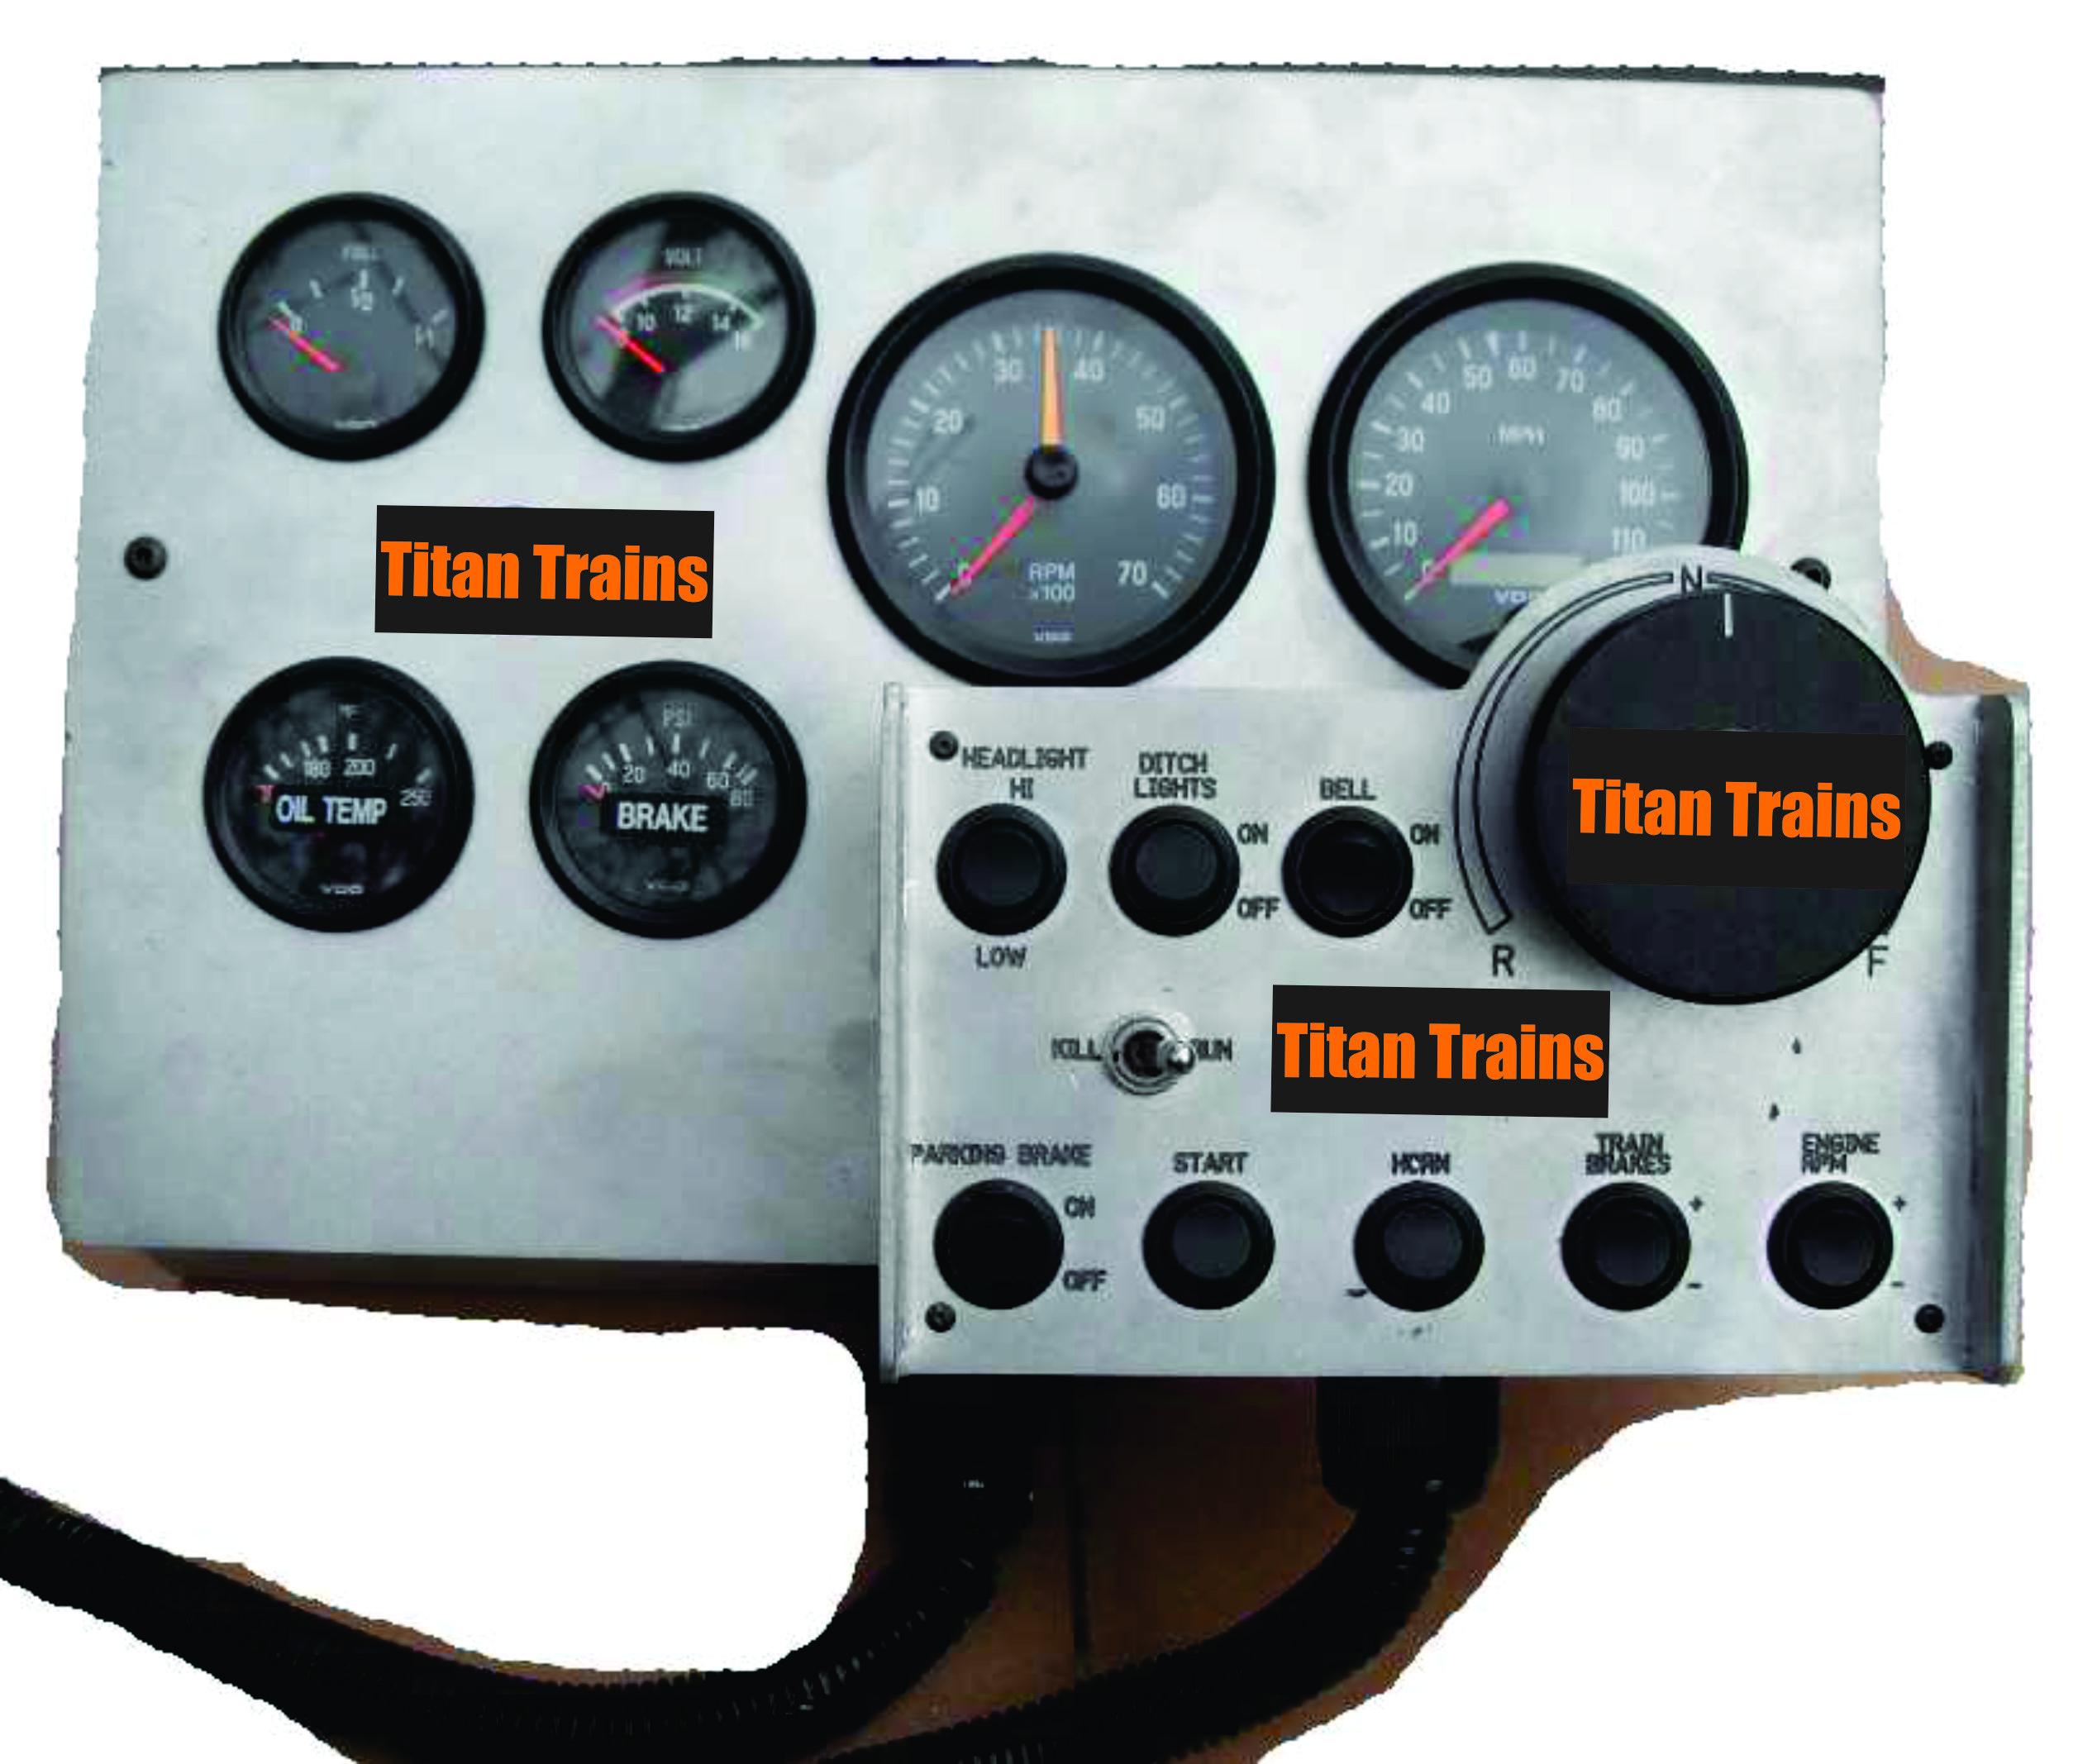 dash-panel.jpg